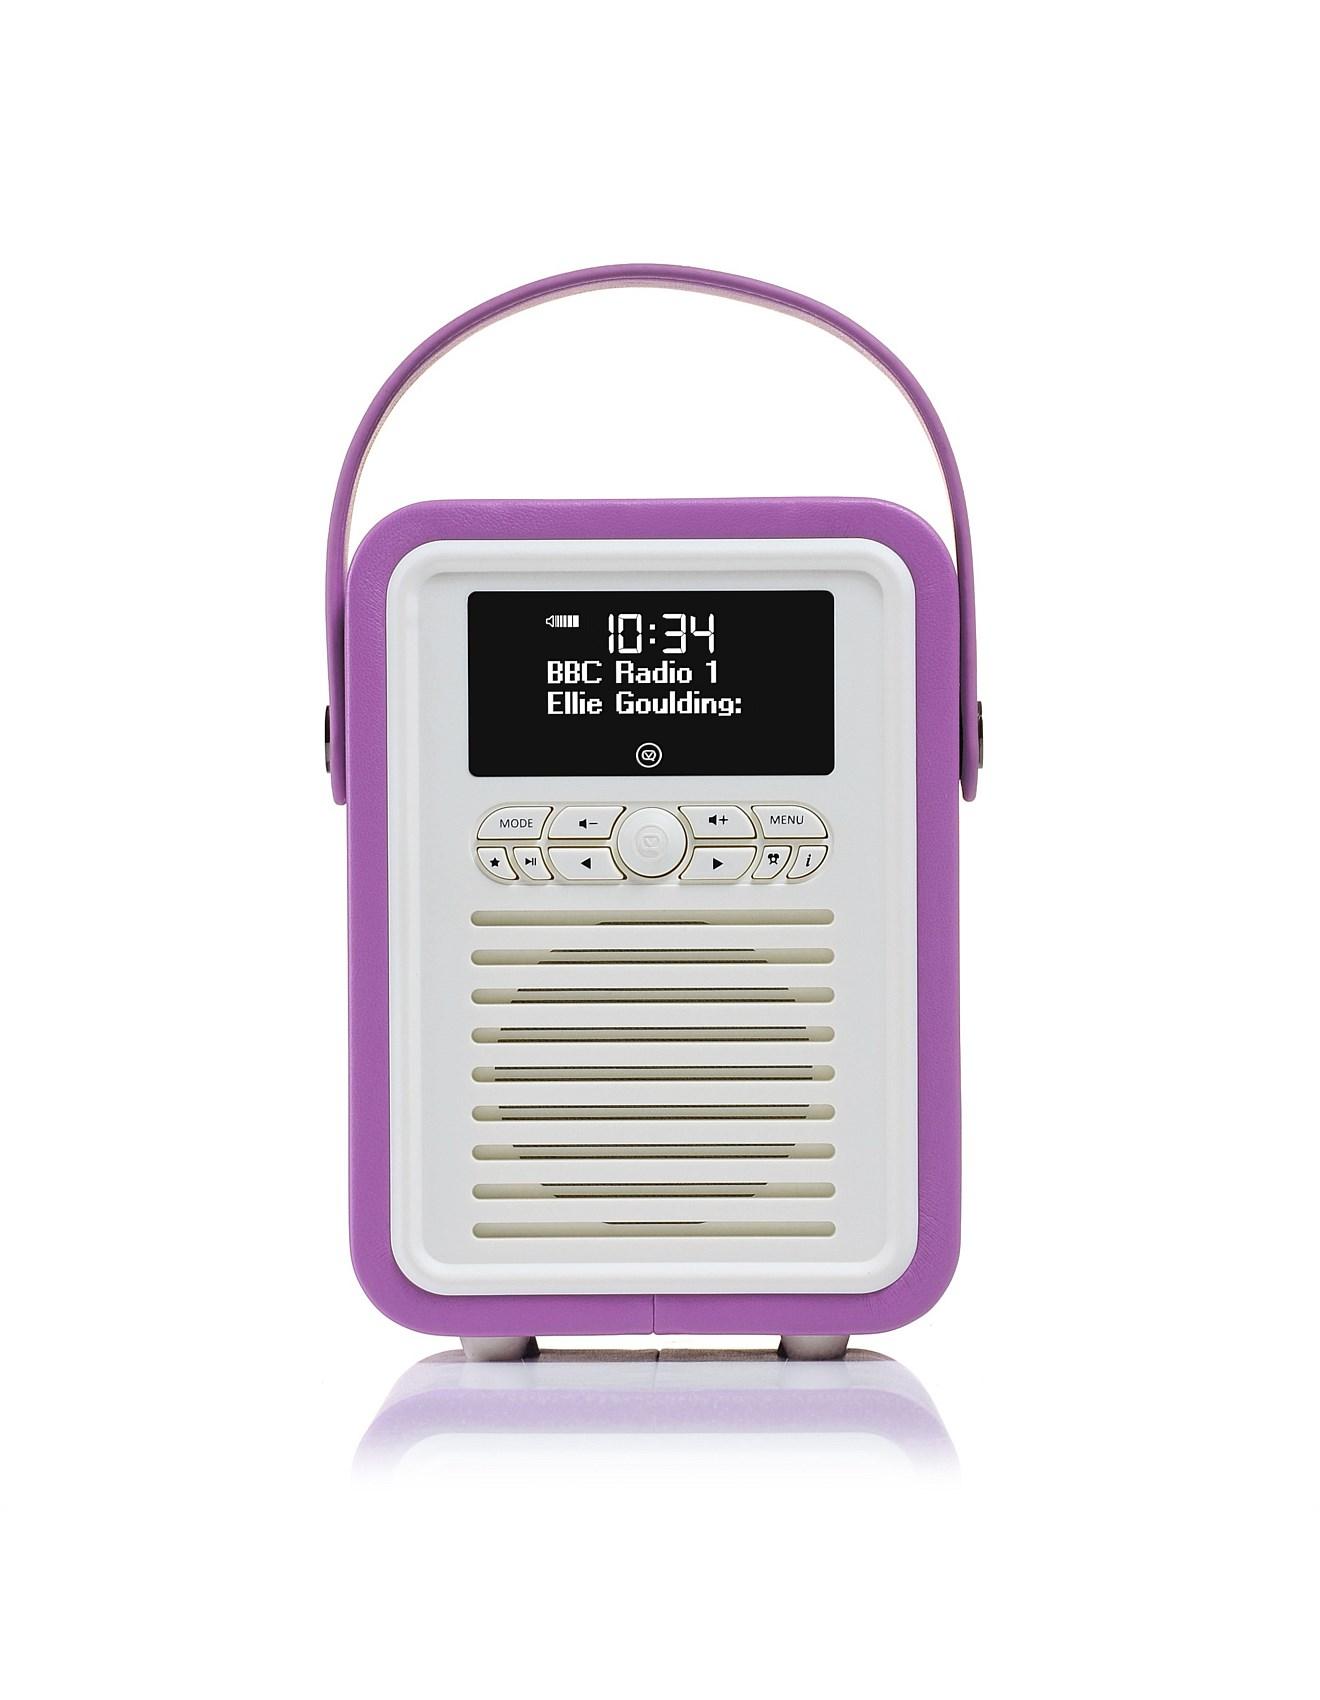 radios buy dab digital radios online david jones vq. Black Bedroom Furniture Sets. Home Design Ideas